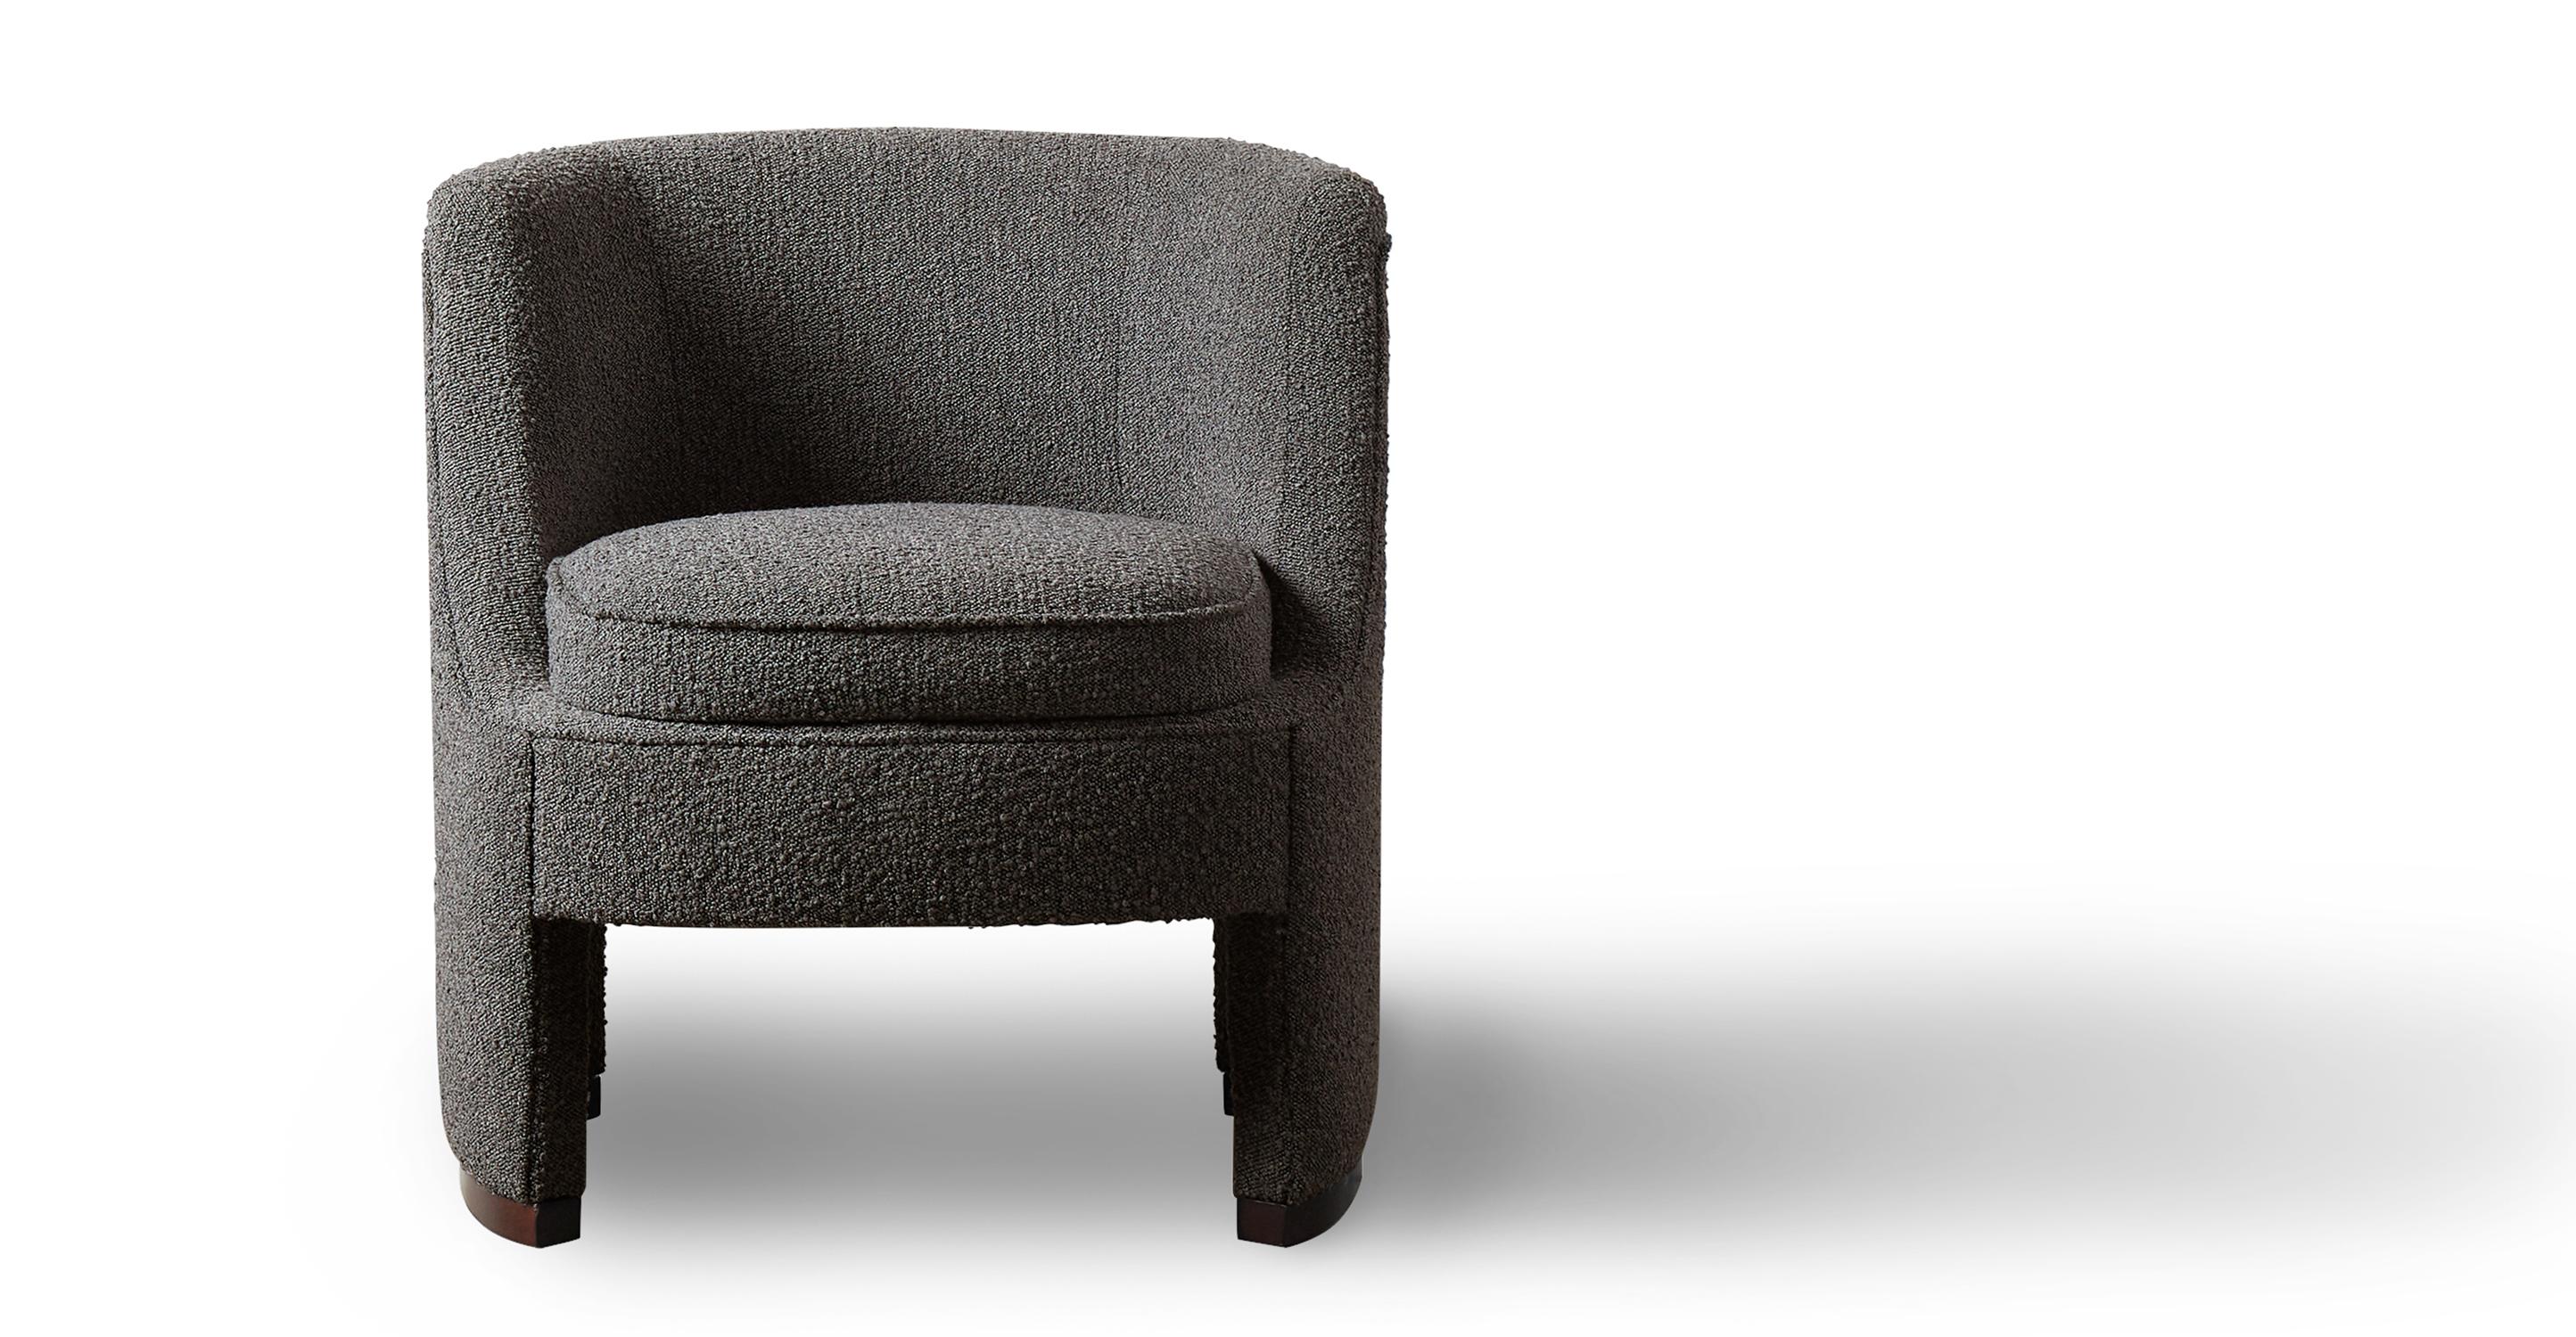 "Roxy 28"" Fabric Chair, Charred Boucle"